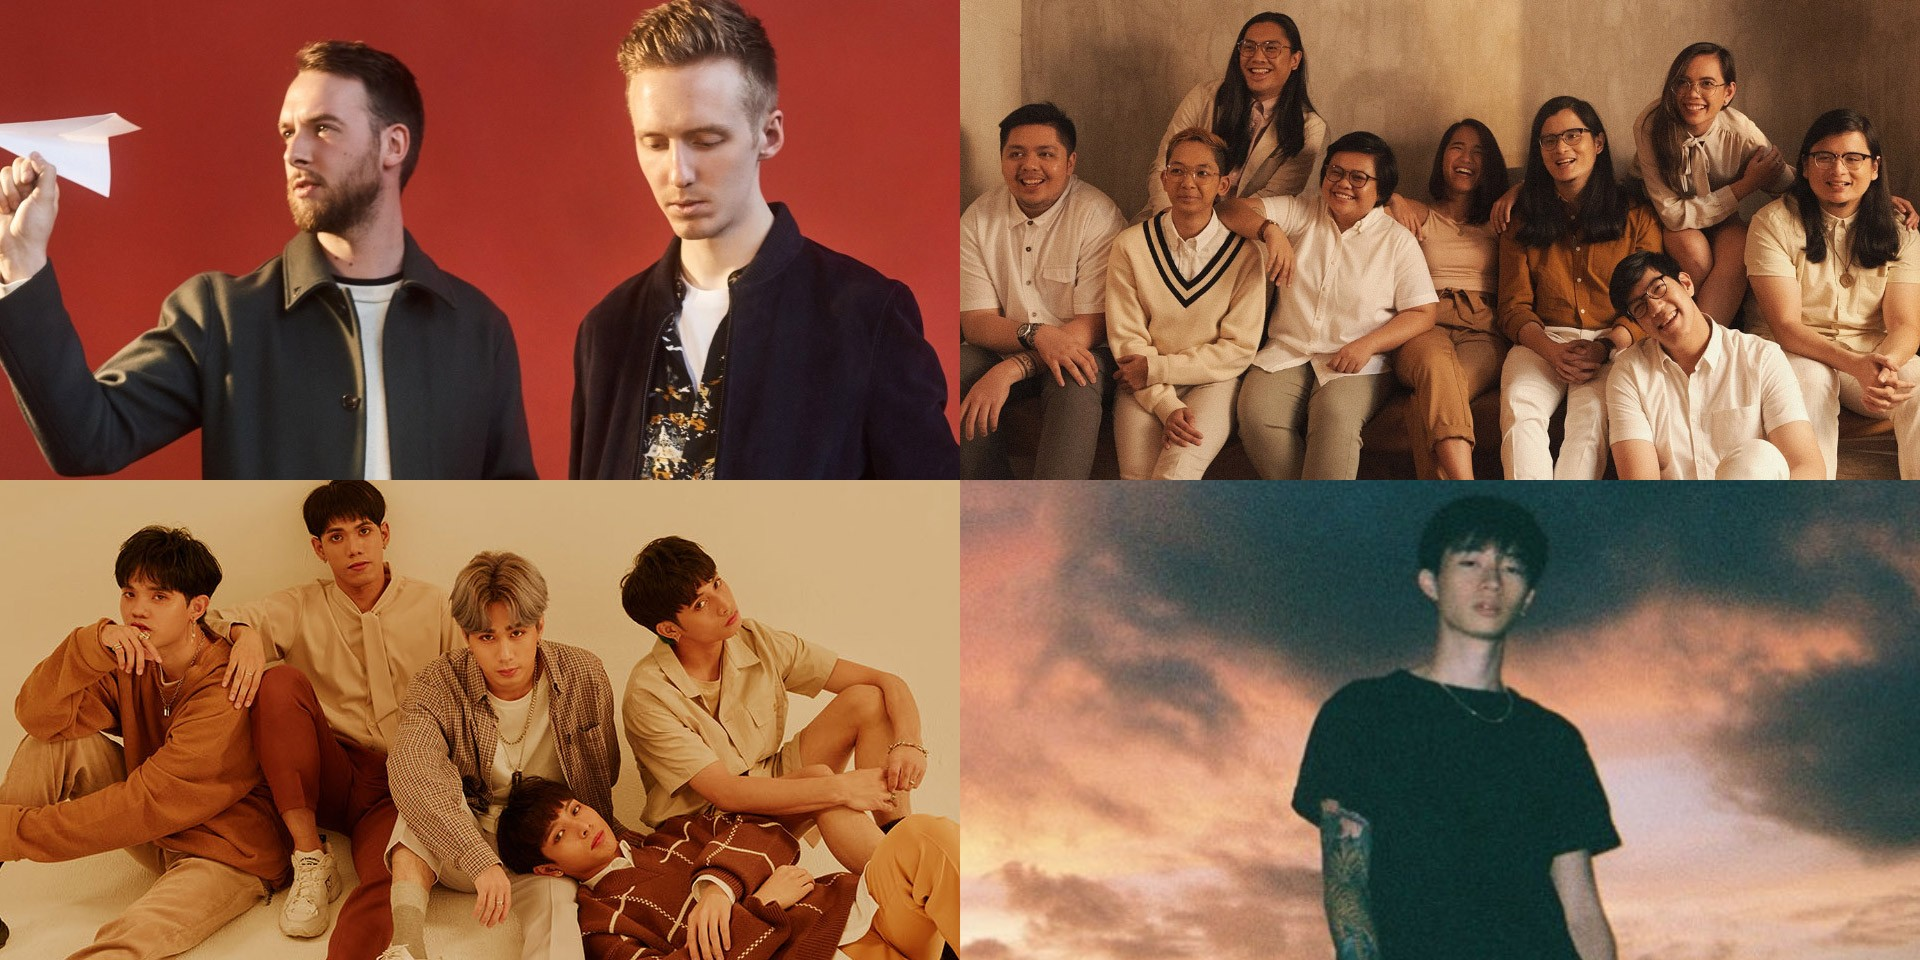 Honne, Powfu, Keshi, SB19, KZ Tandingan, Ben&Ben, and more to perform at MYX Music Awards 2020